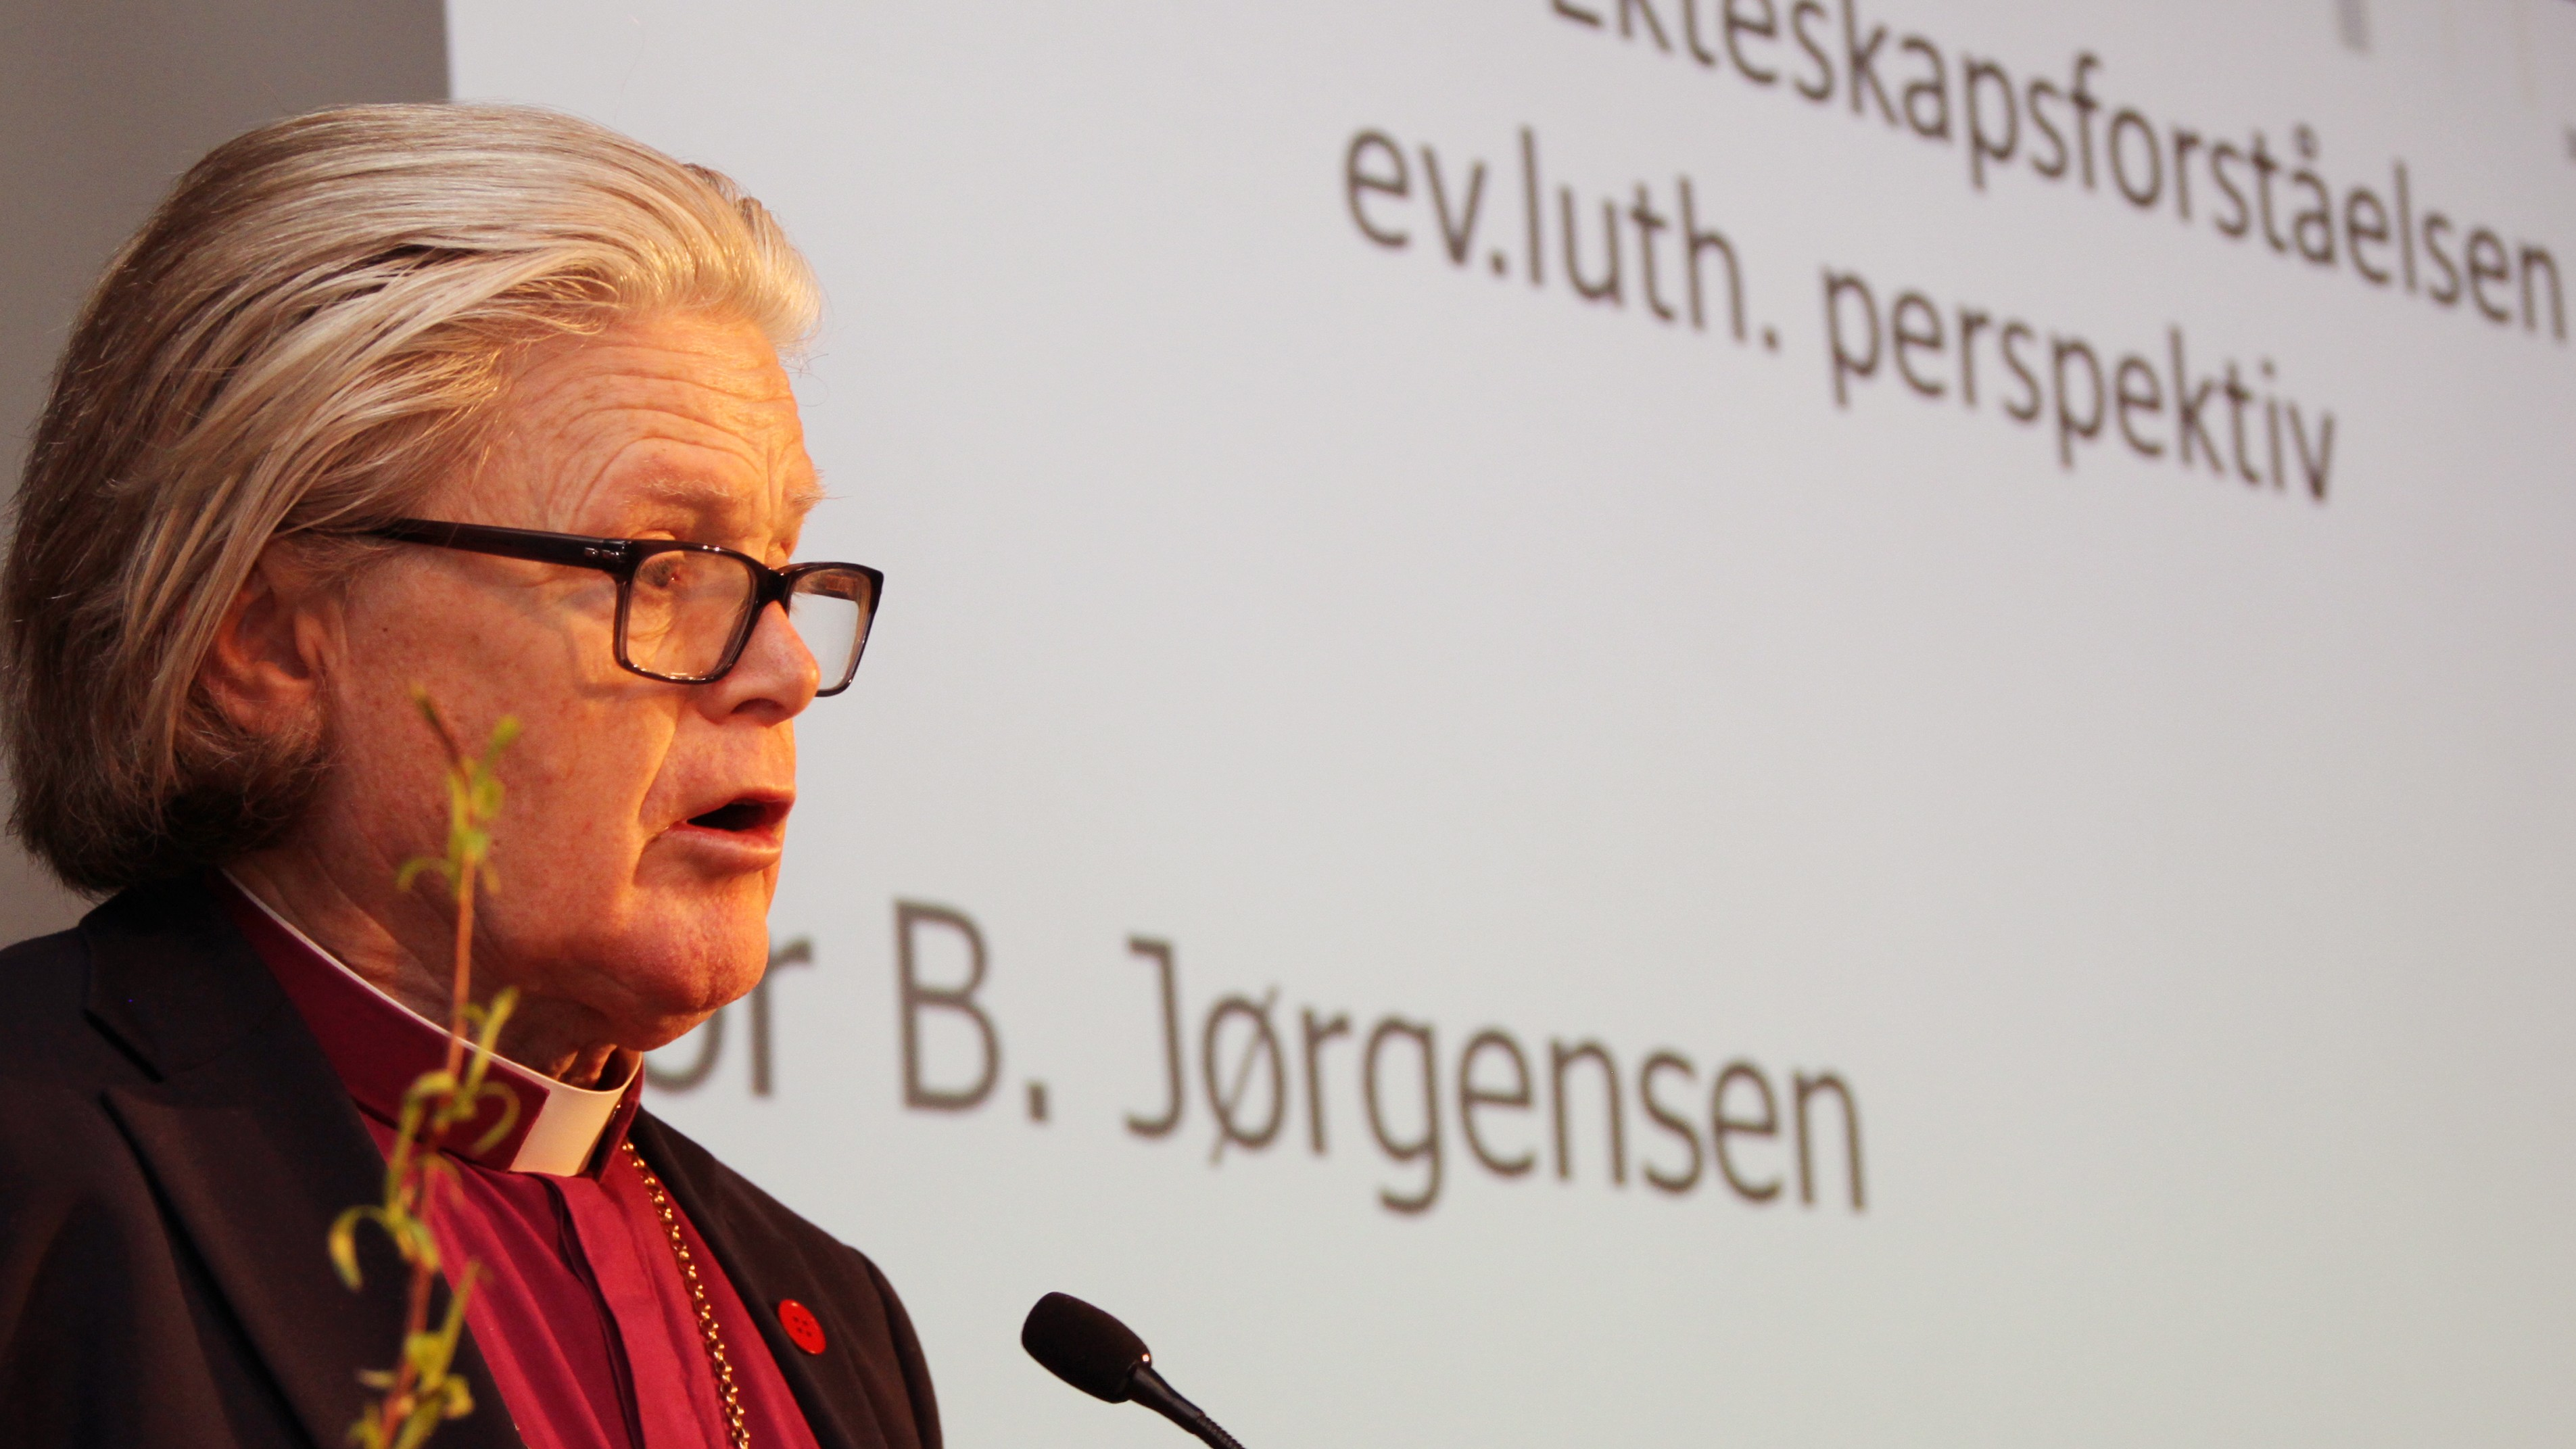 liturgier den norske kirke